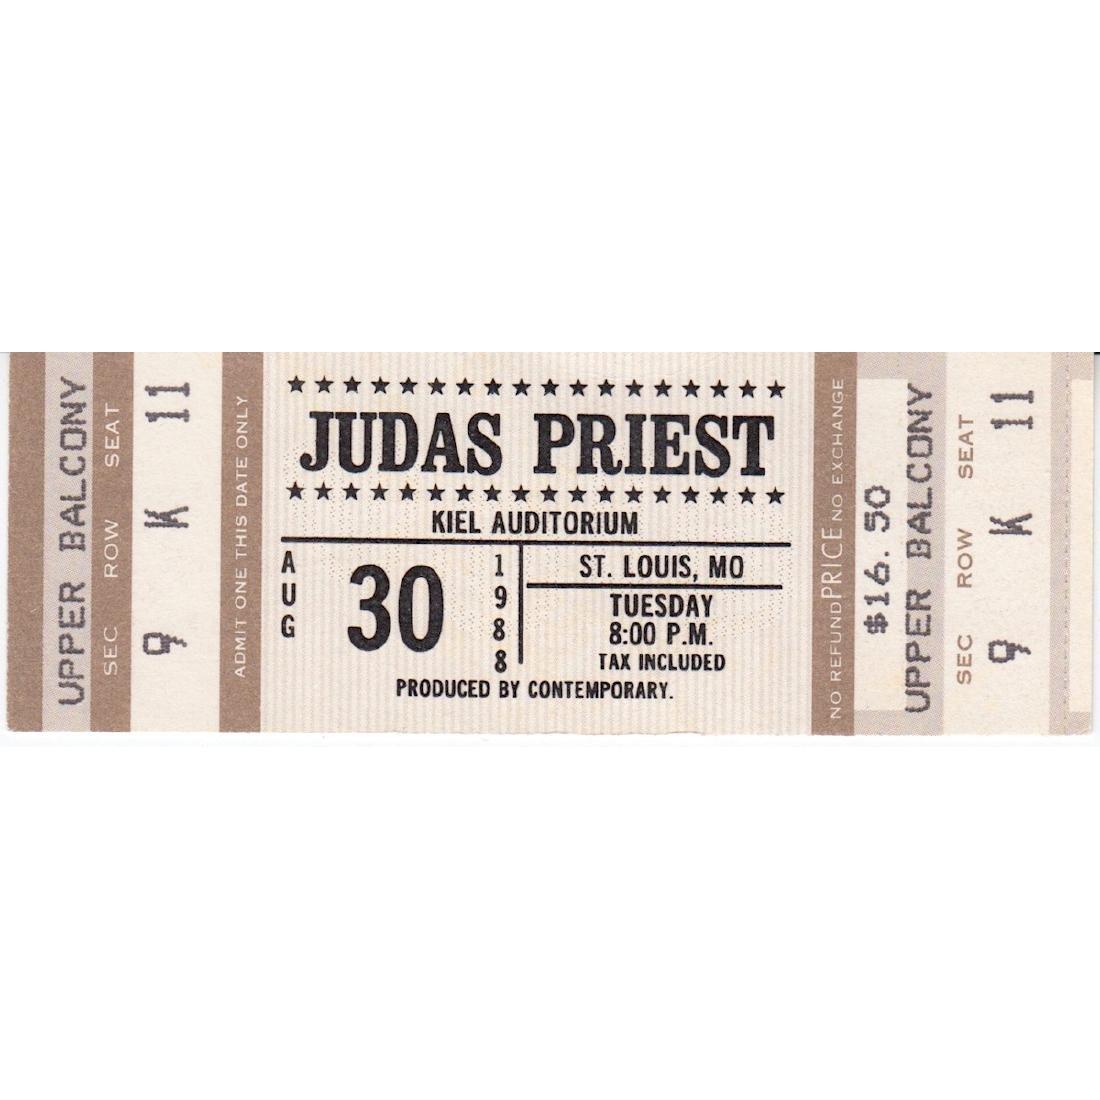 Judas Priest - 1988 Vintage Concert Ticket